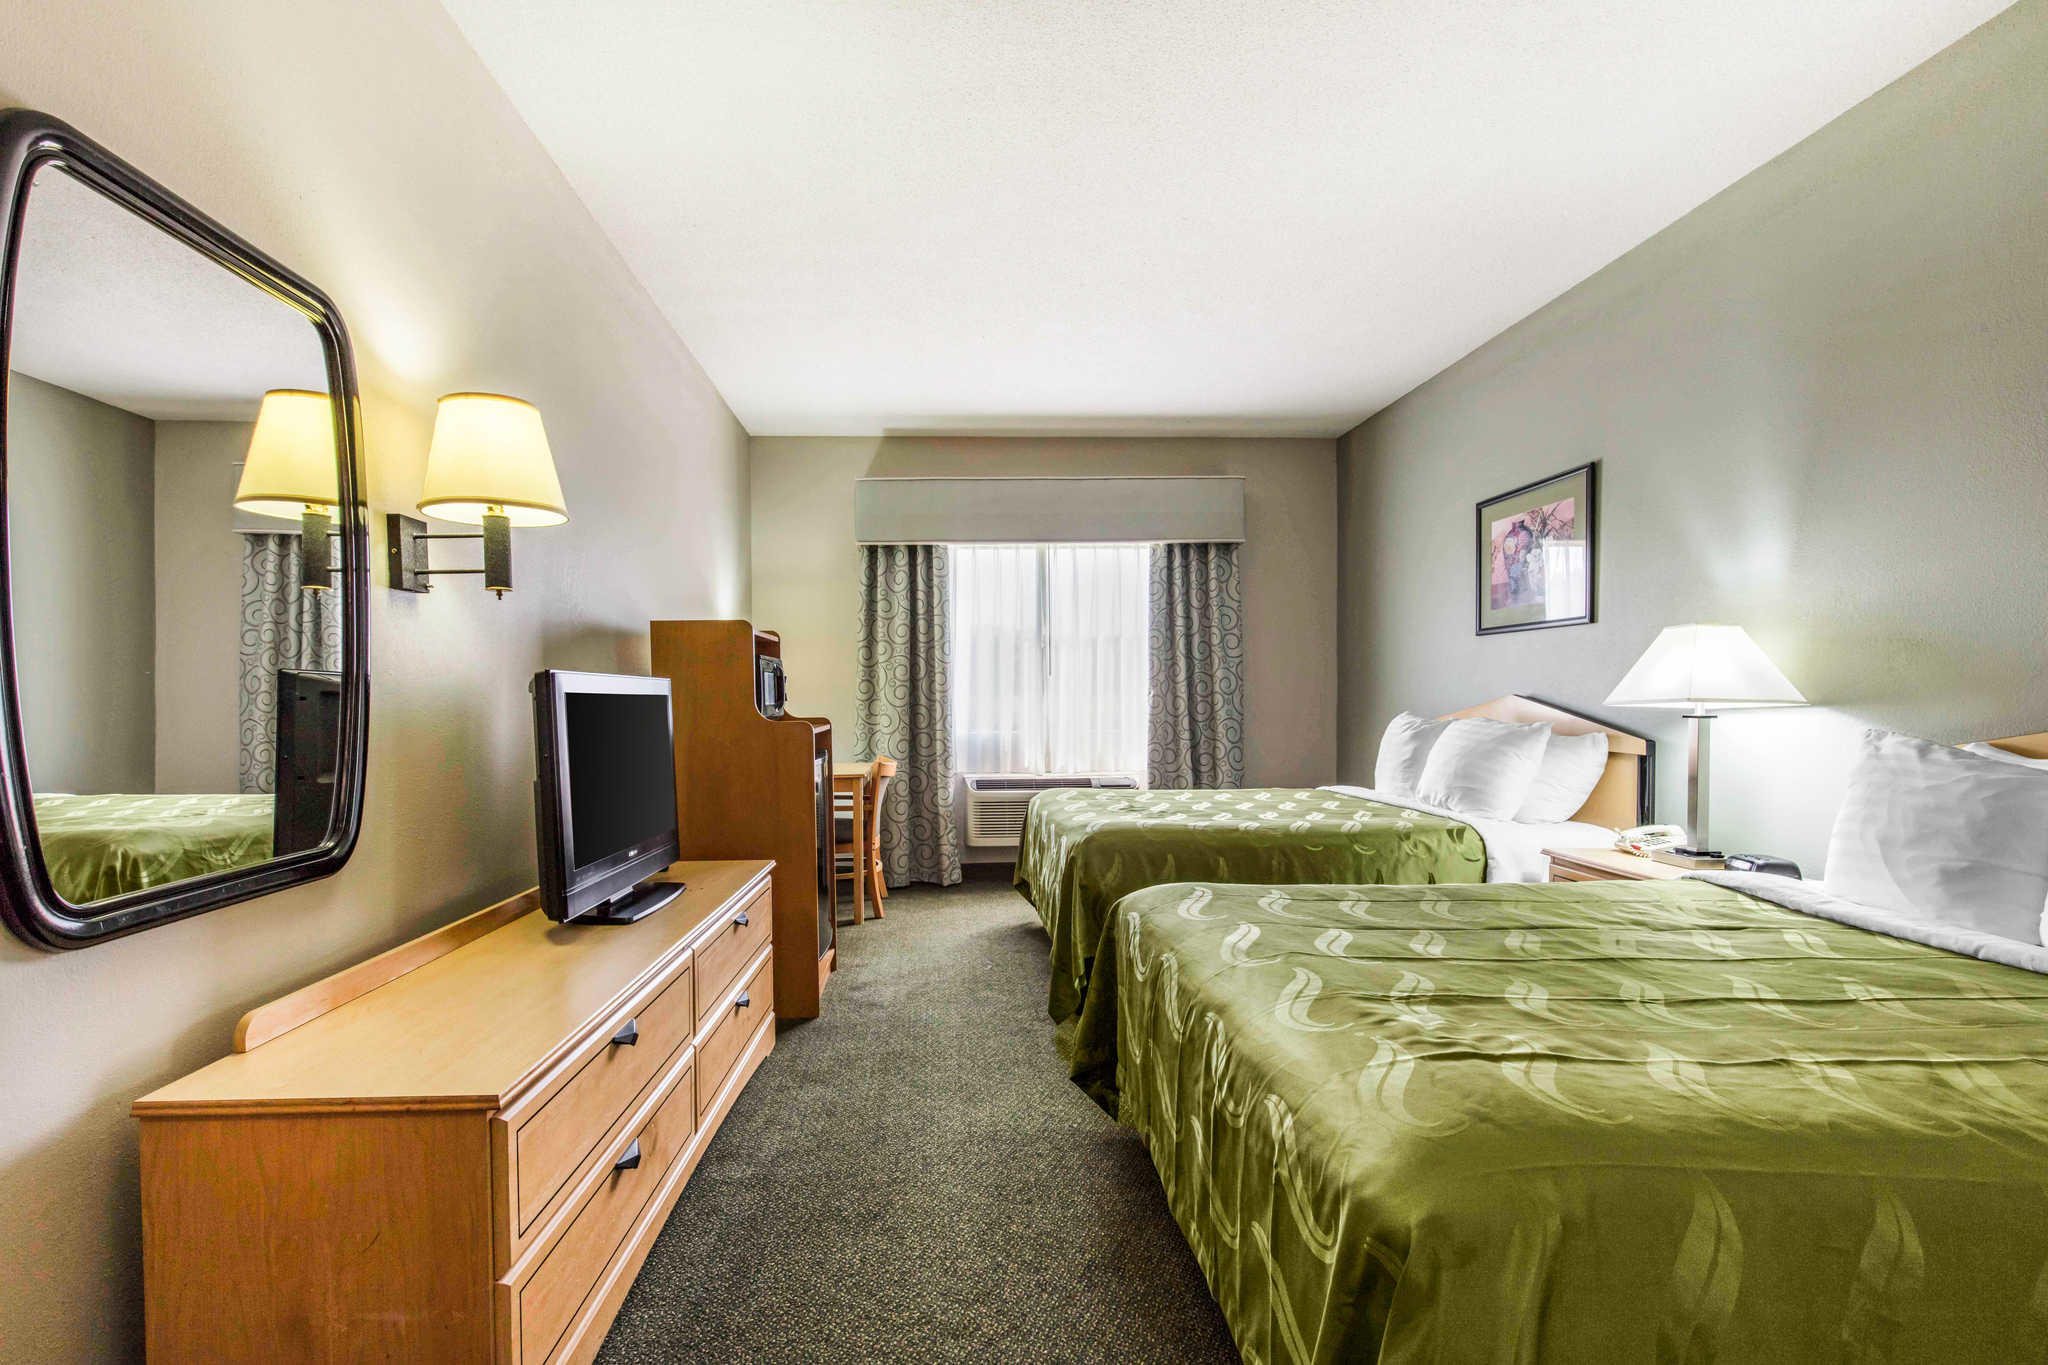 Quality Inn & Suites Jackson Int'l Airport image 0